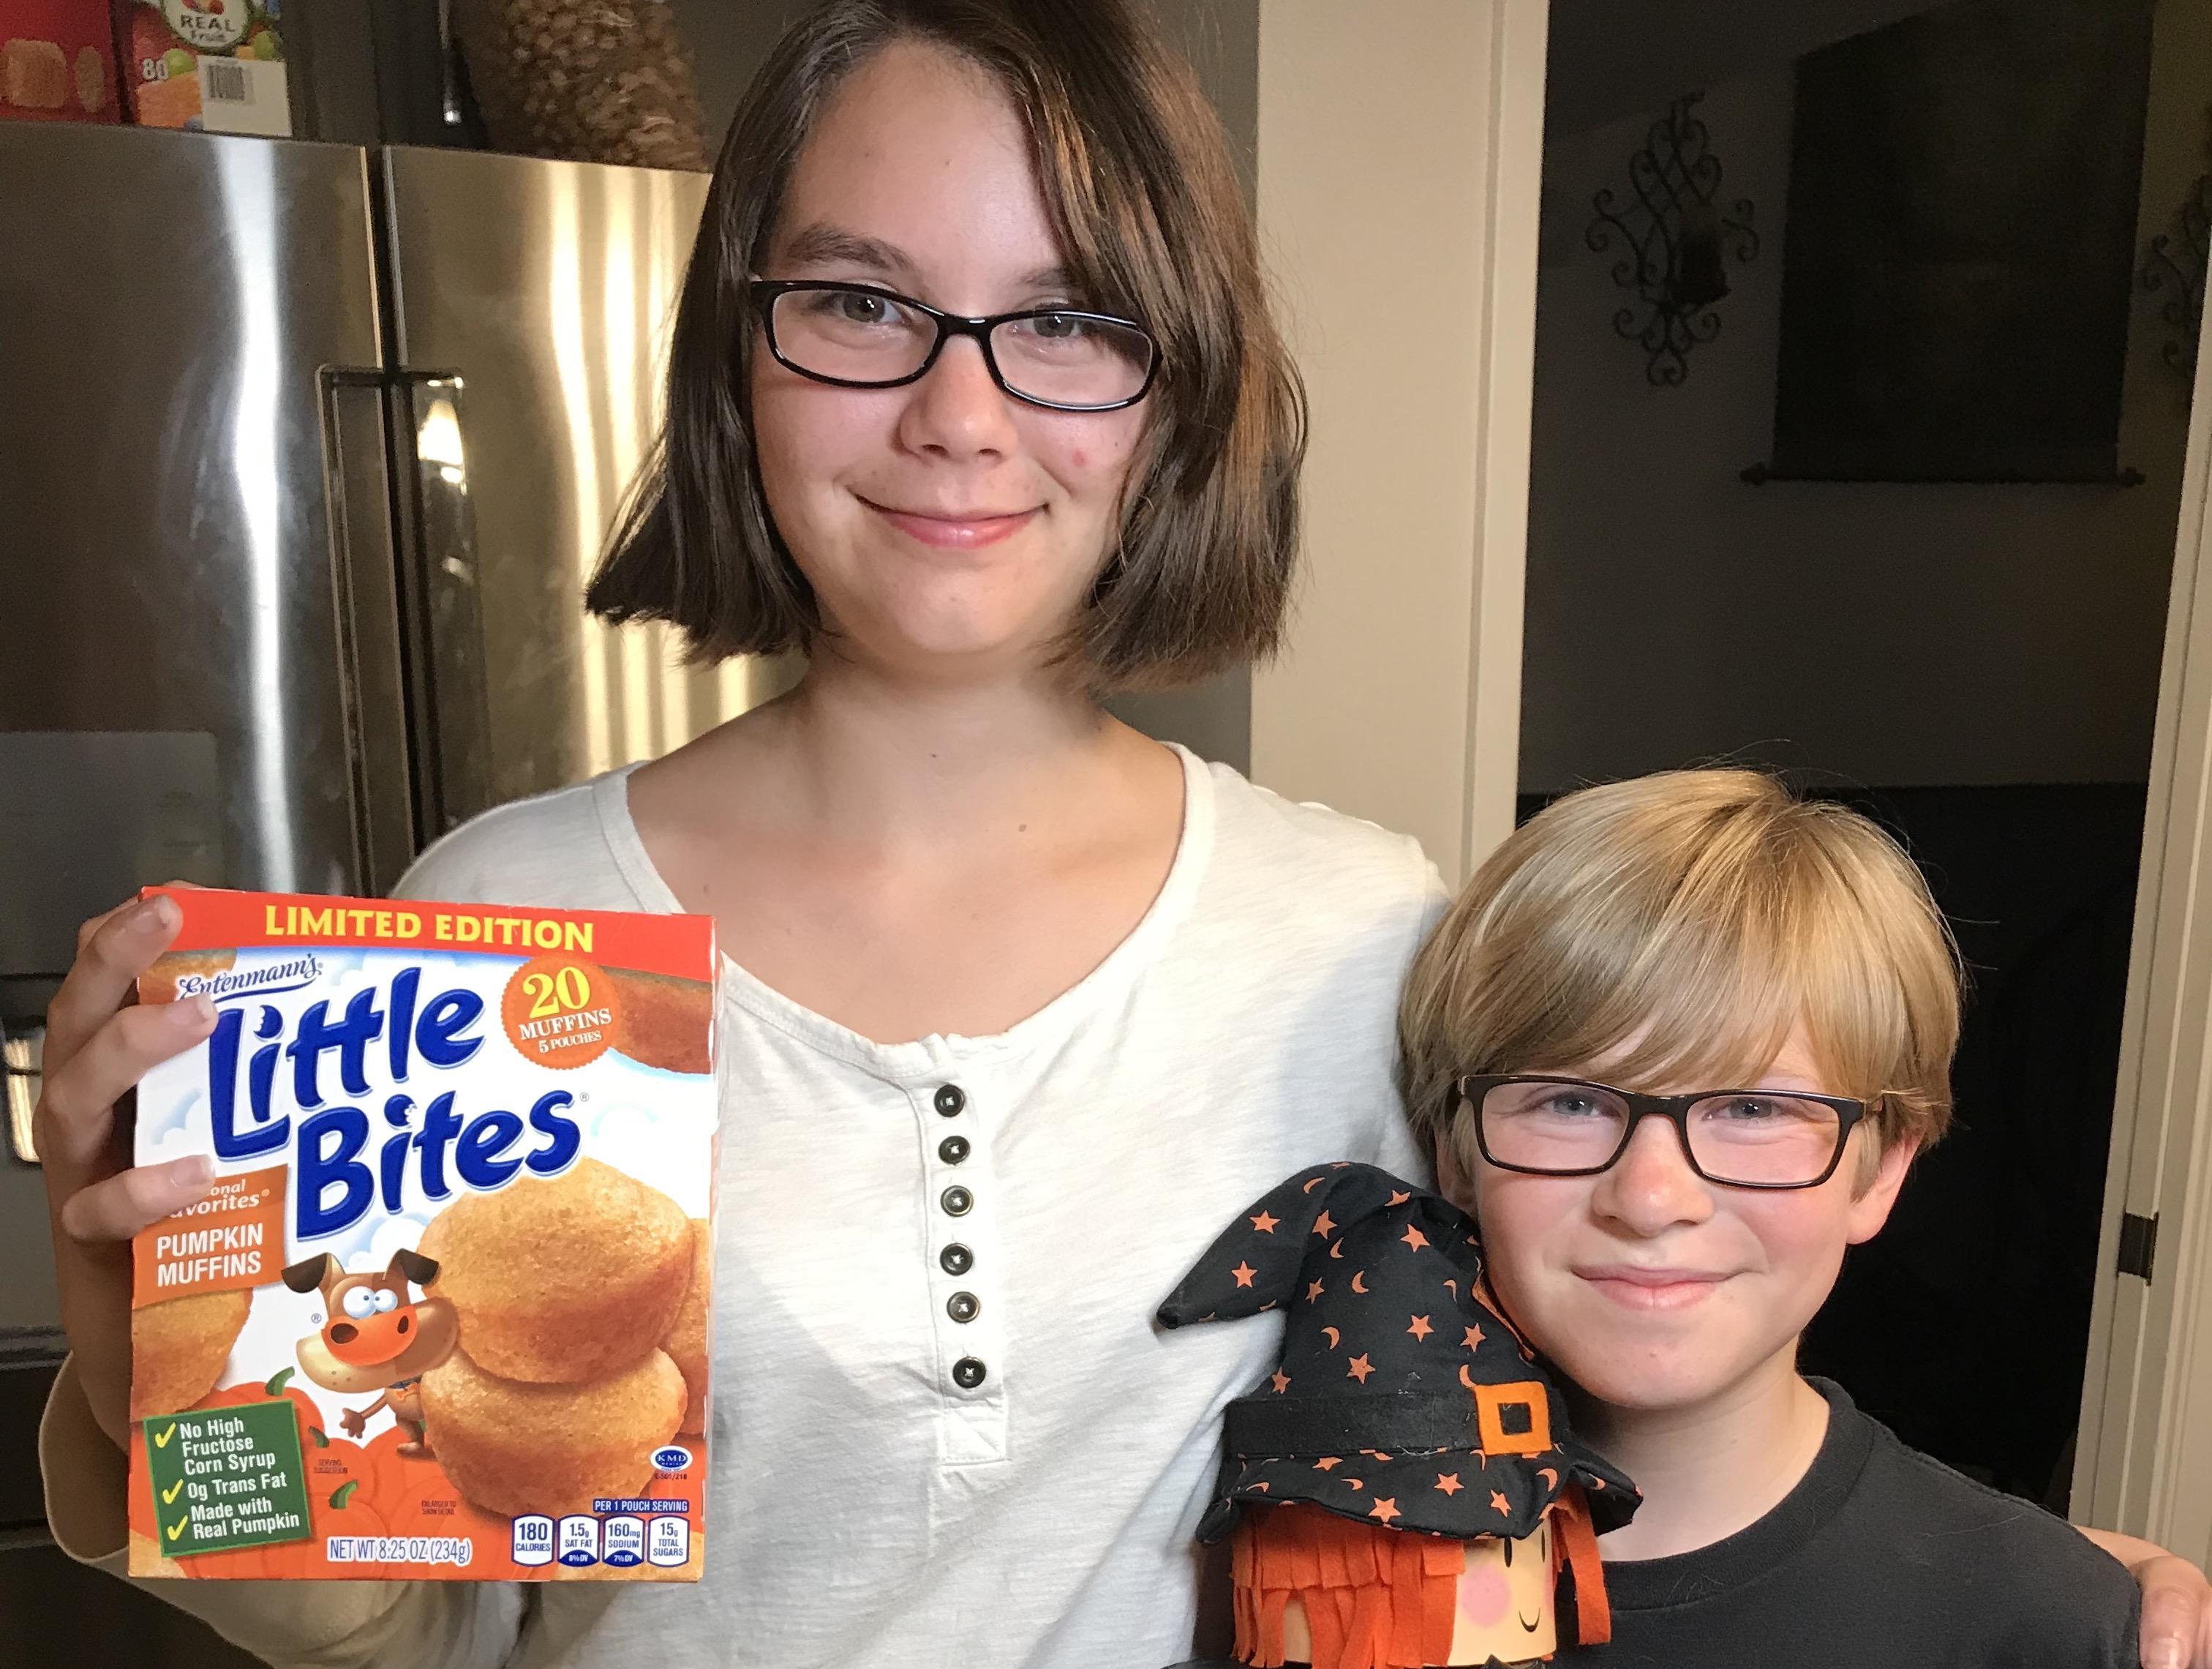 Little Bites Pumpkin #LittleBites #Entenmanns #food #foodie #giveaway #ad